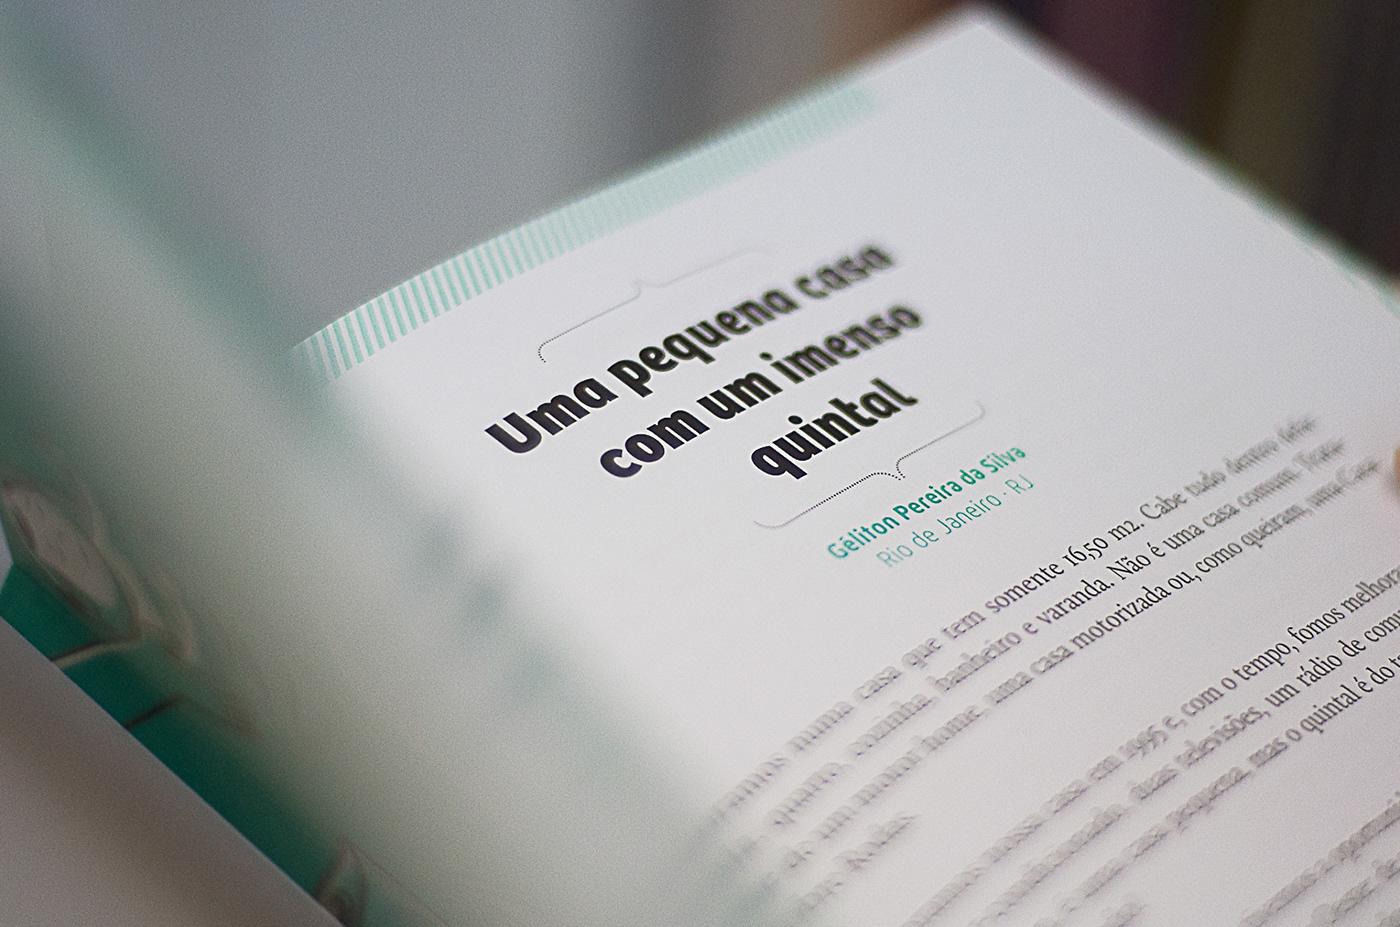 design Livro editorial laerte silvino corisco Fachesf Ilustração ILLUSTRATION  book illu